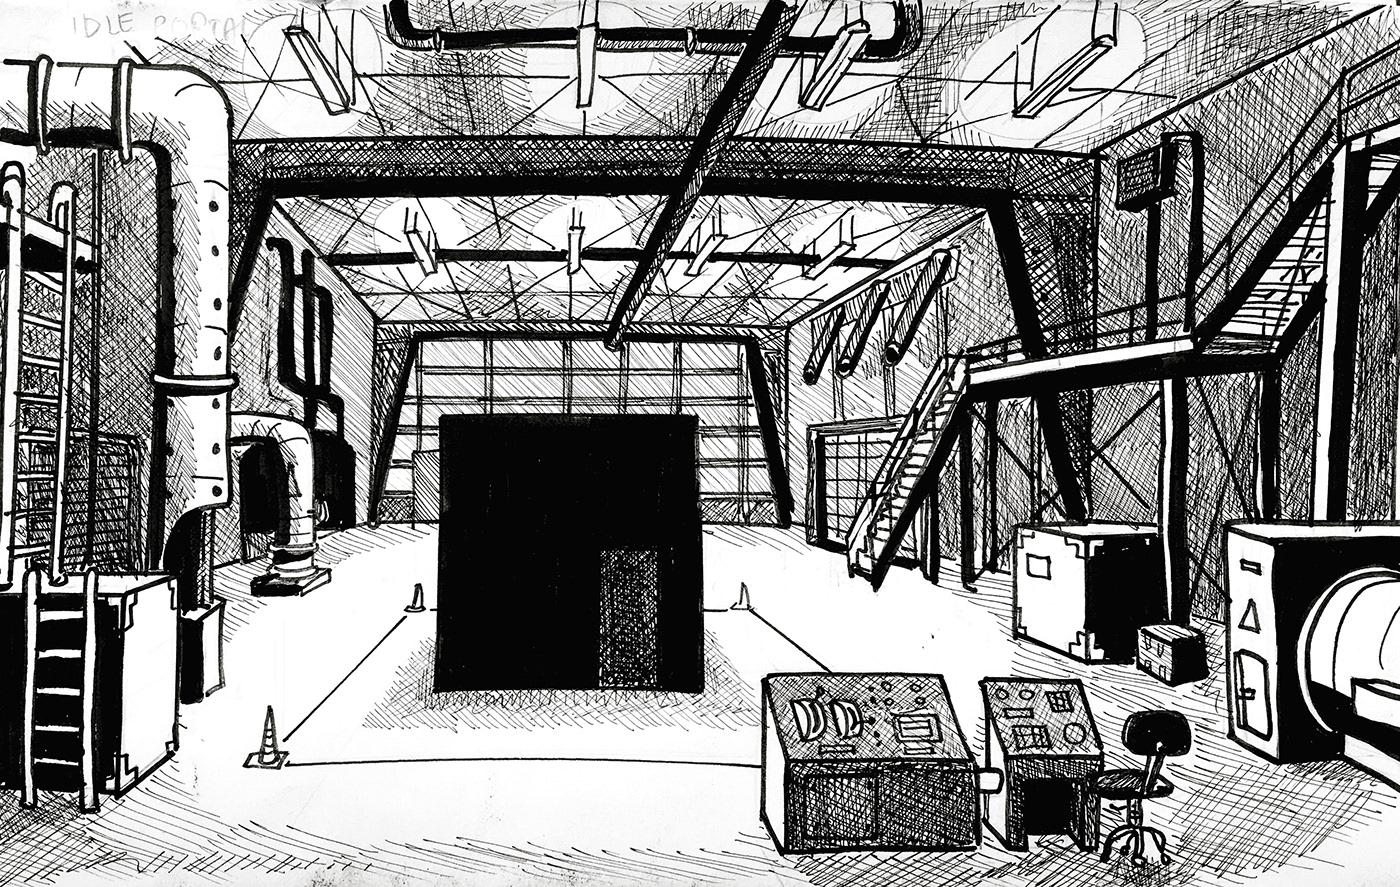 chernobyl comics Exclusion Zone post apocalypse ukraine Urban drawing urban exploration